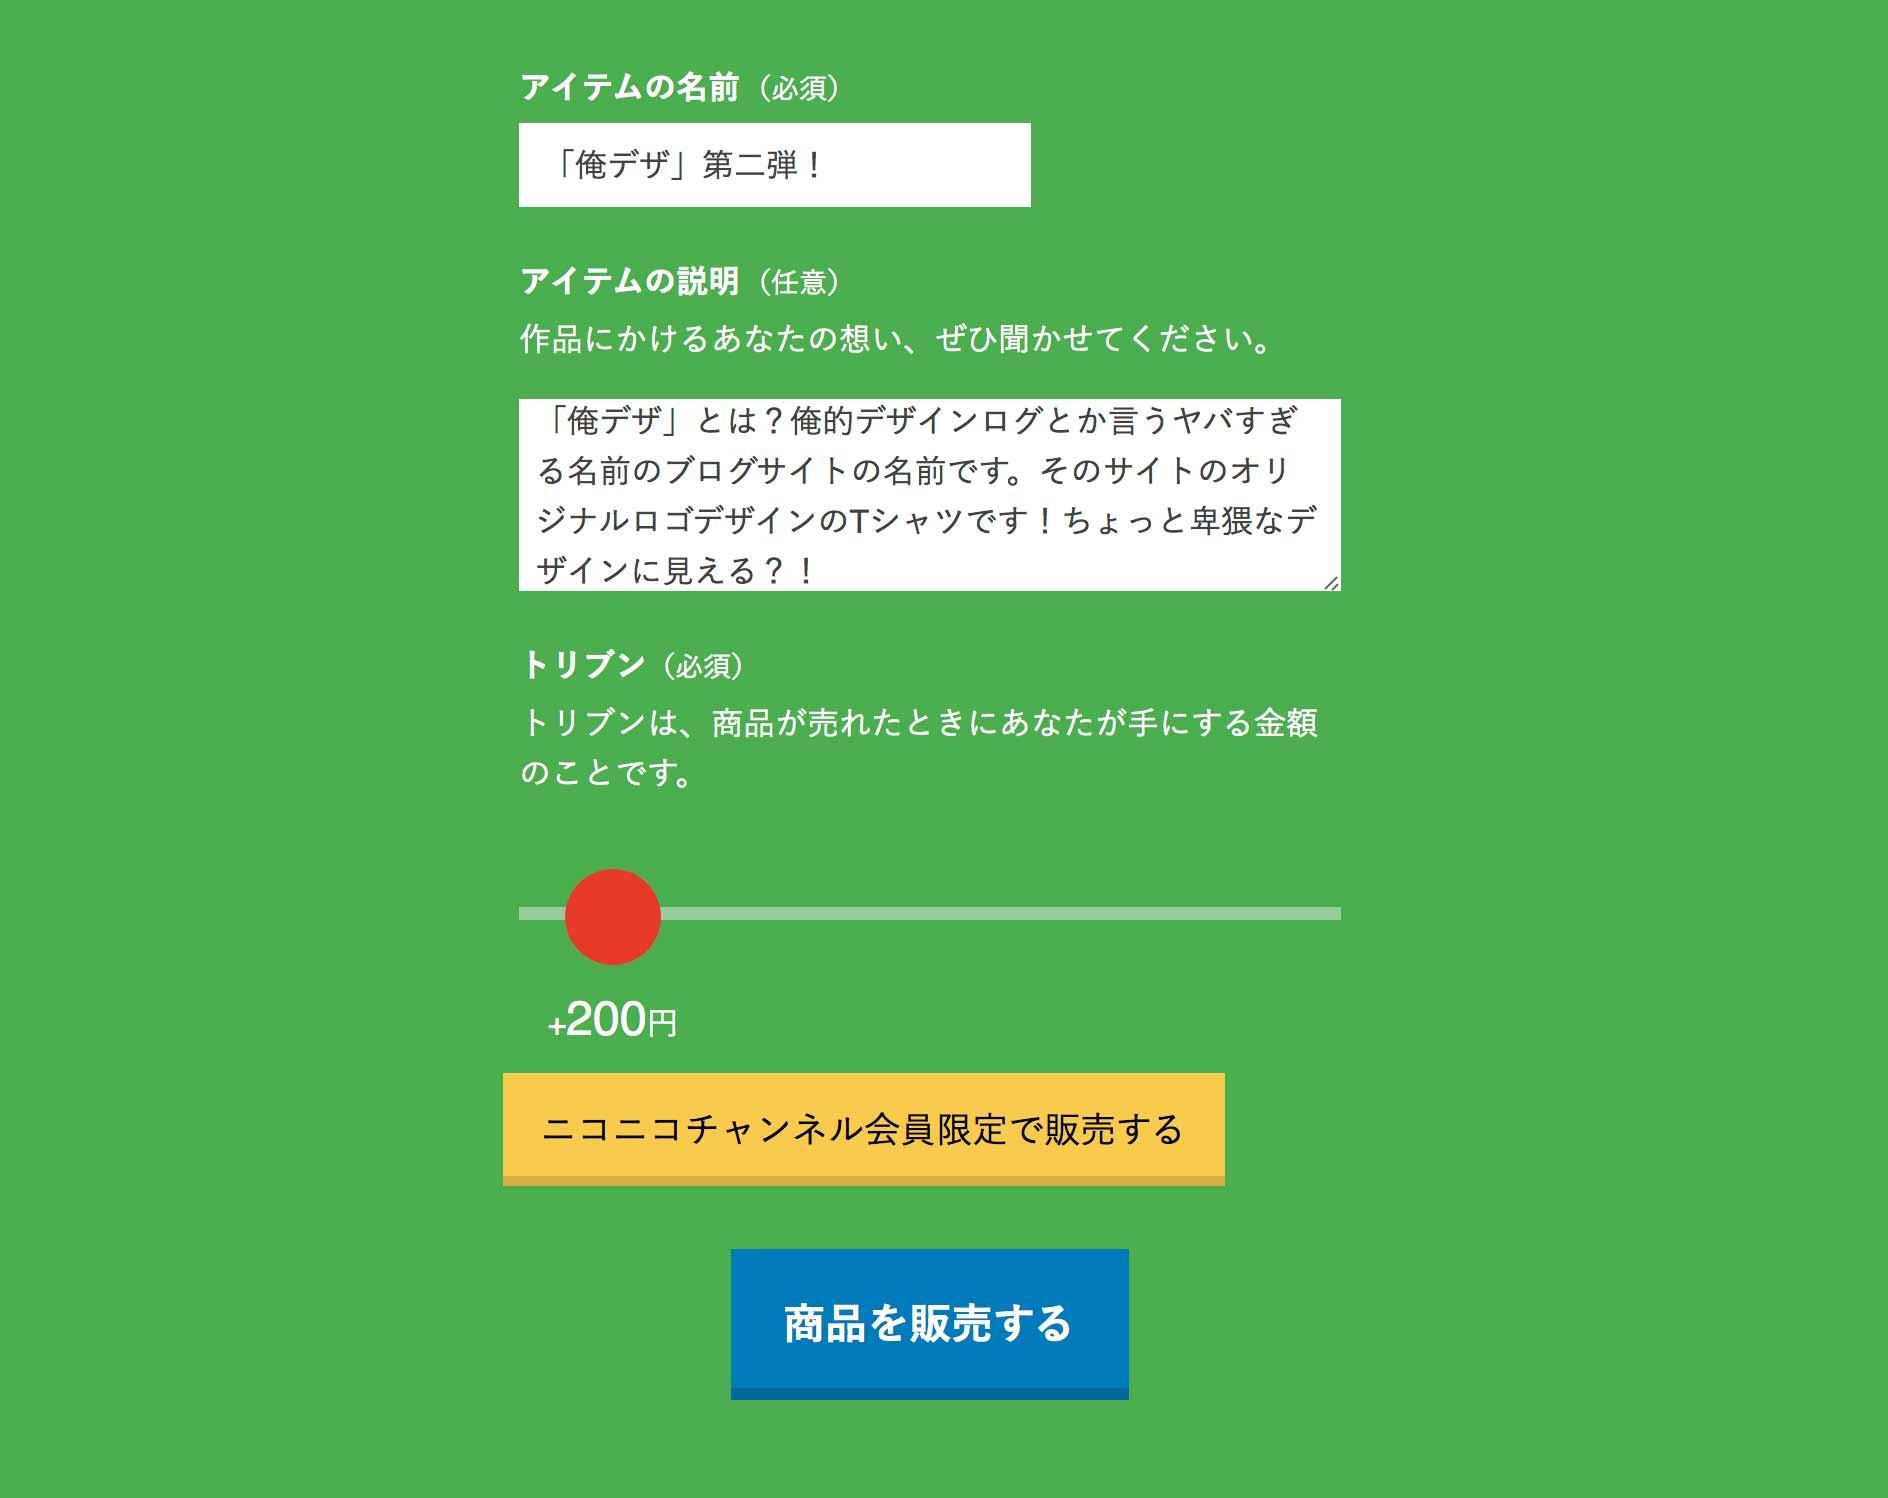 SUZURIオリジナルグッズ制作⑥